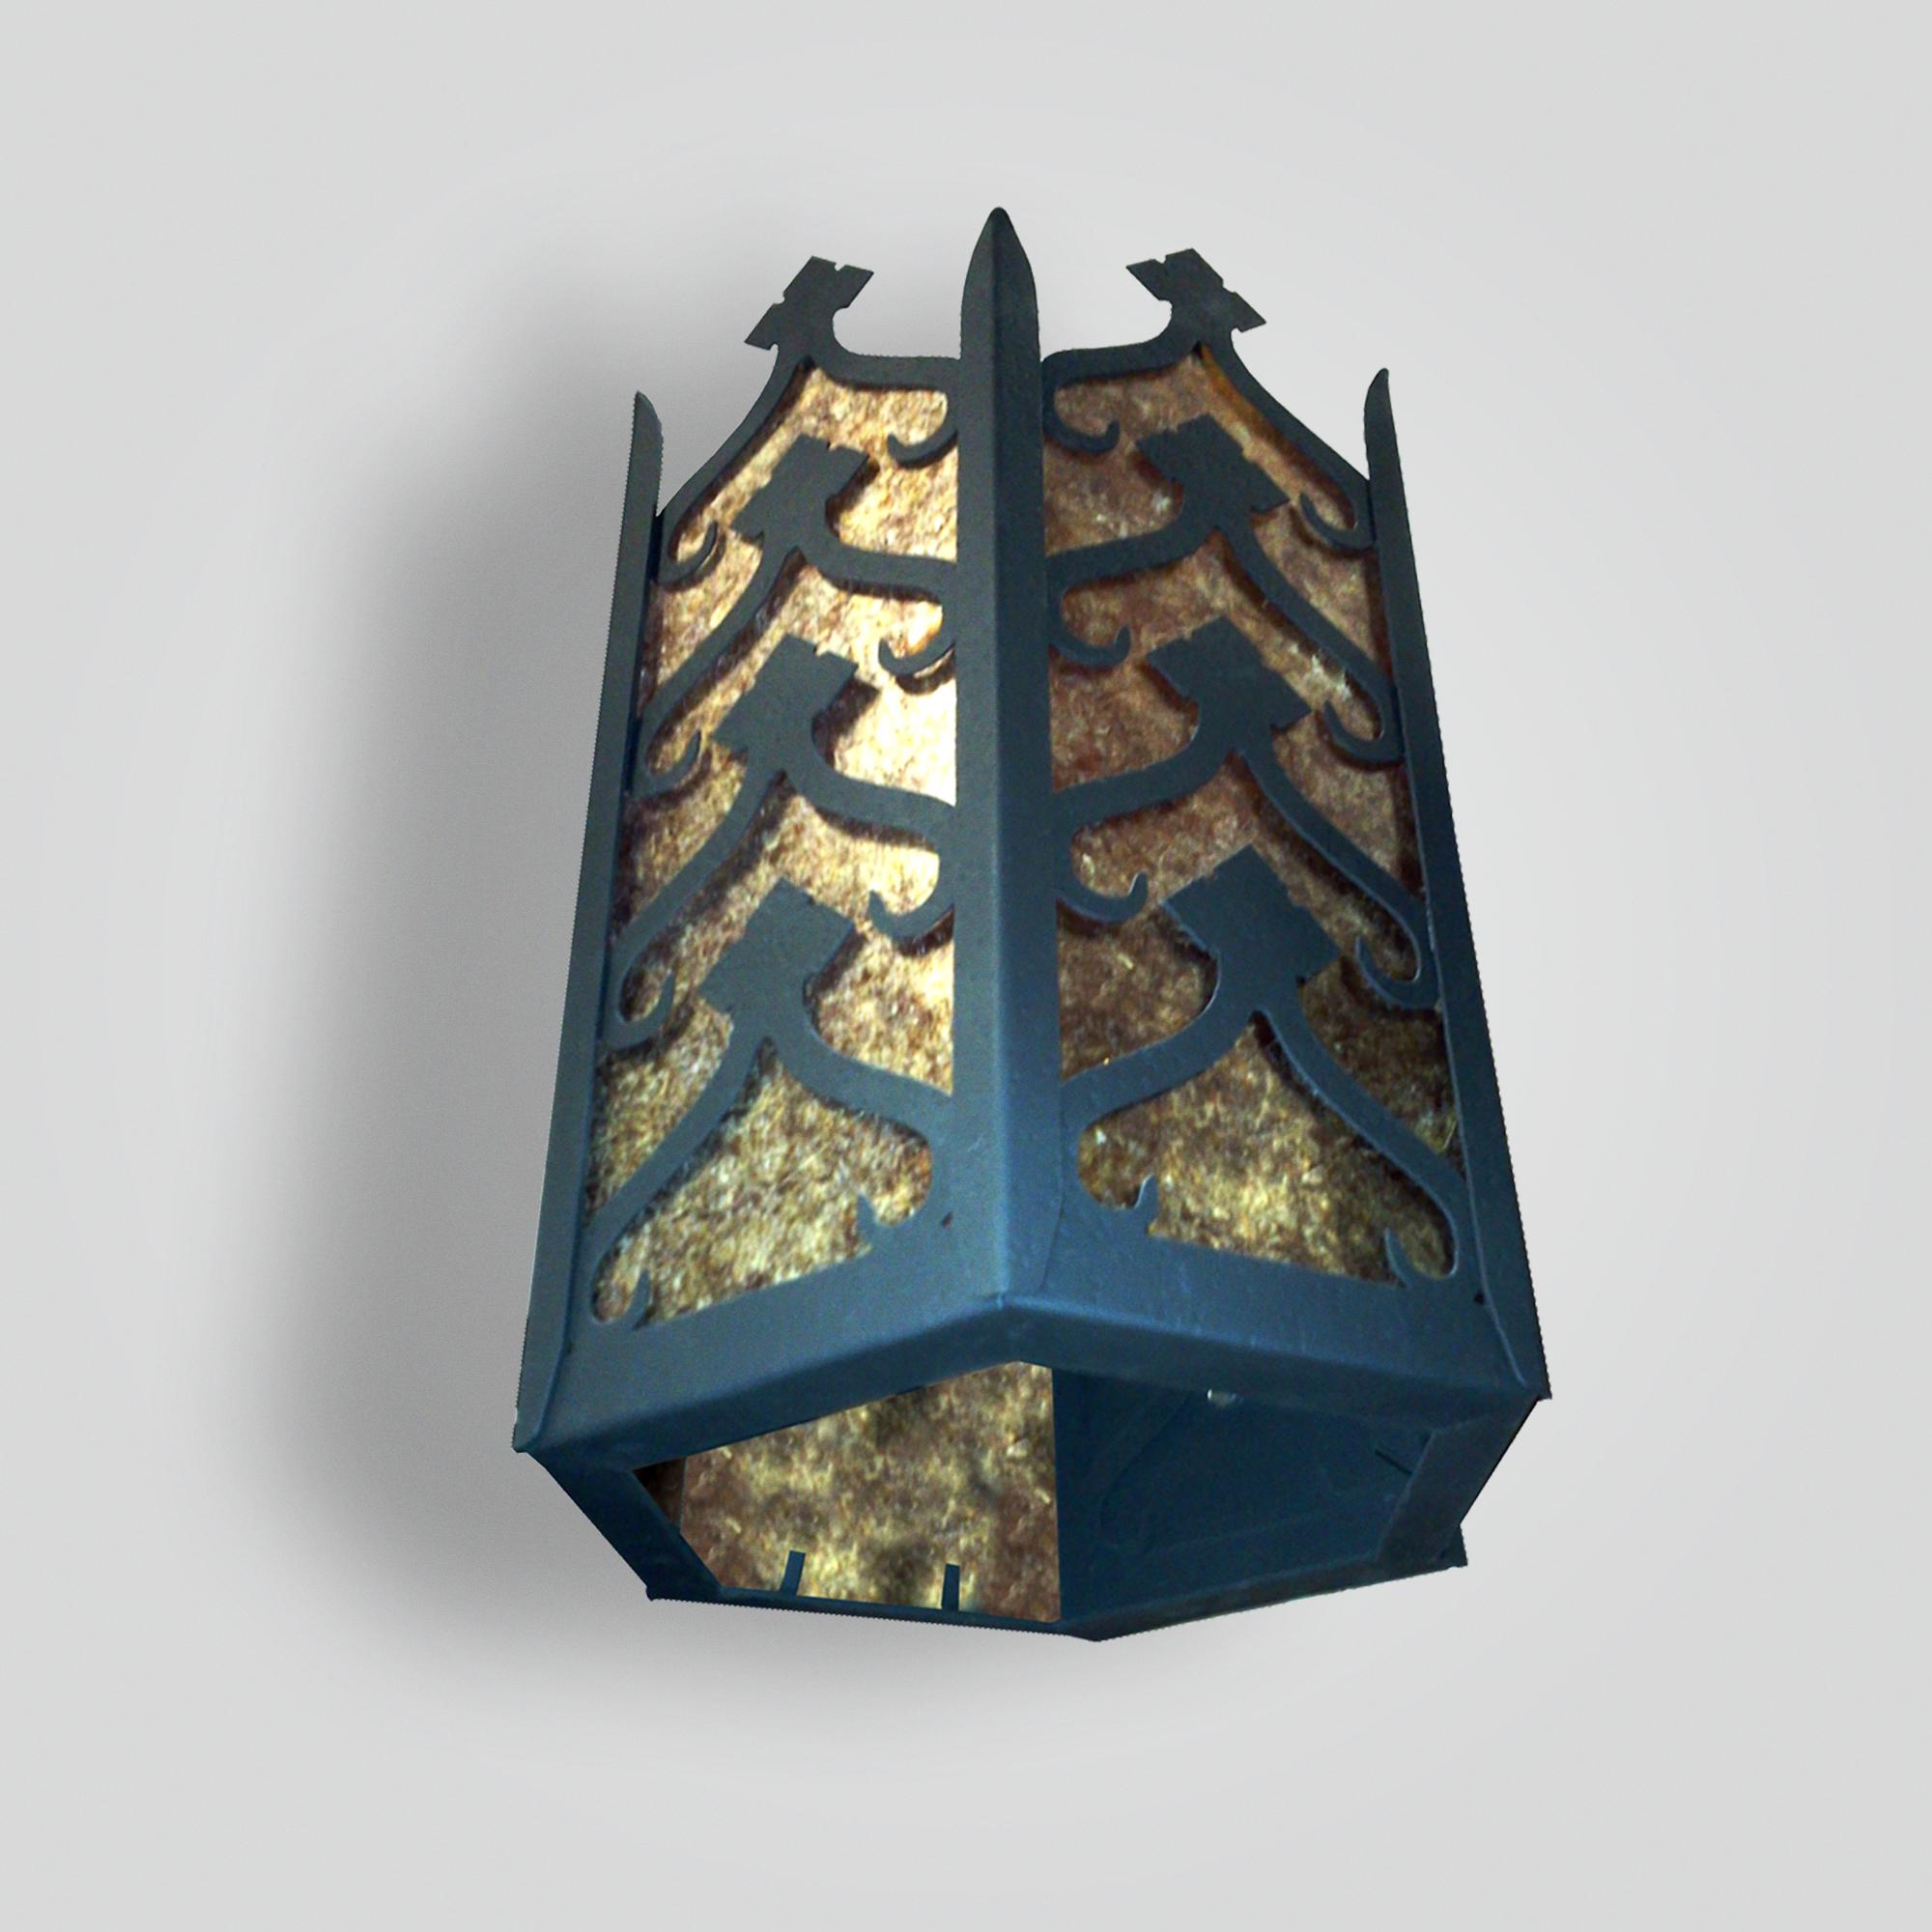 732-mb1-st-w-sh Morroco 6-sided Lantern – ADG Lighting Collection